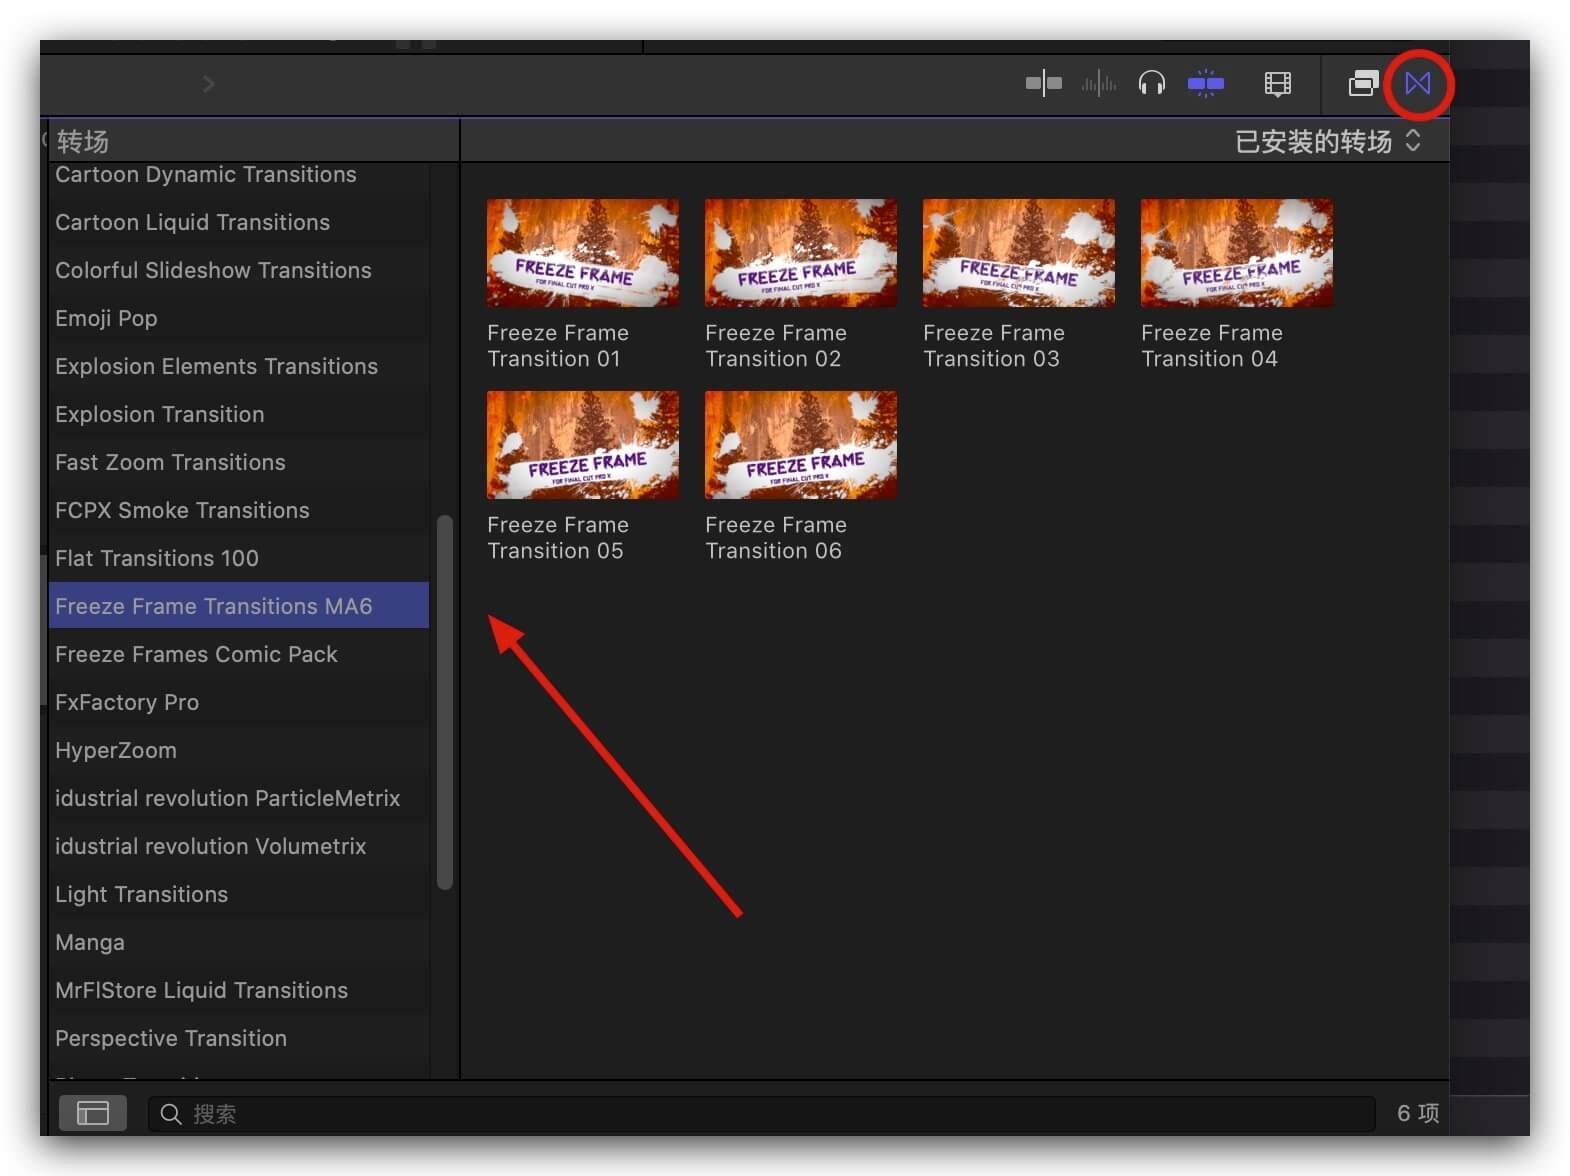 fcpx转场插件 炫酷画面冻结帧泼墨大标题过渡转场 Freeze Frame Transitions